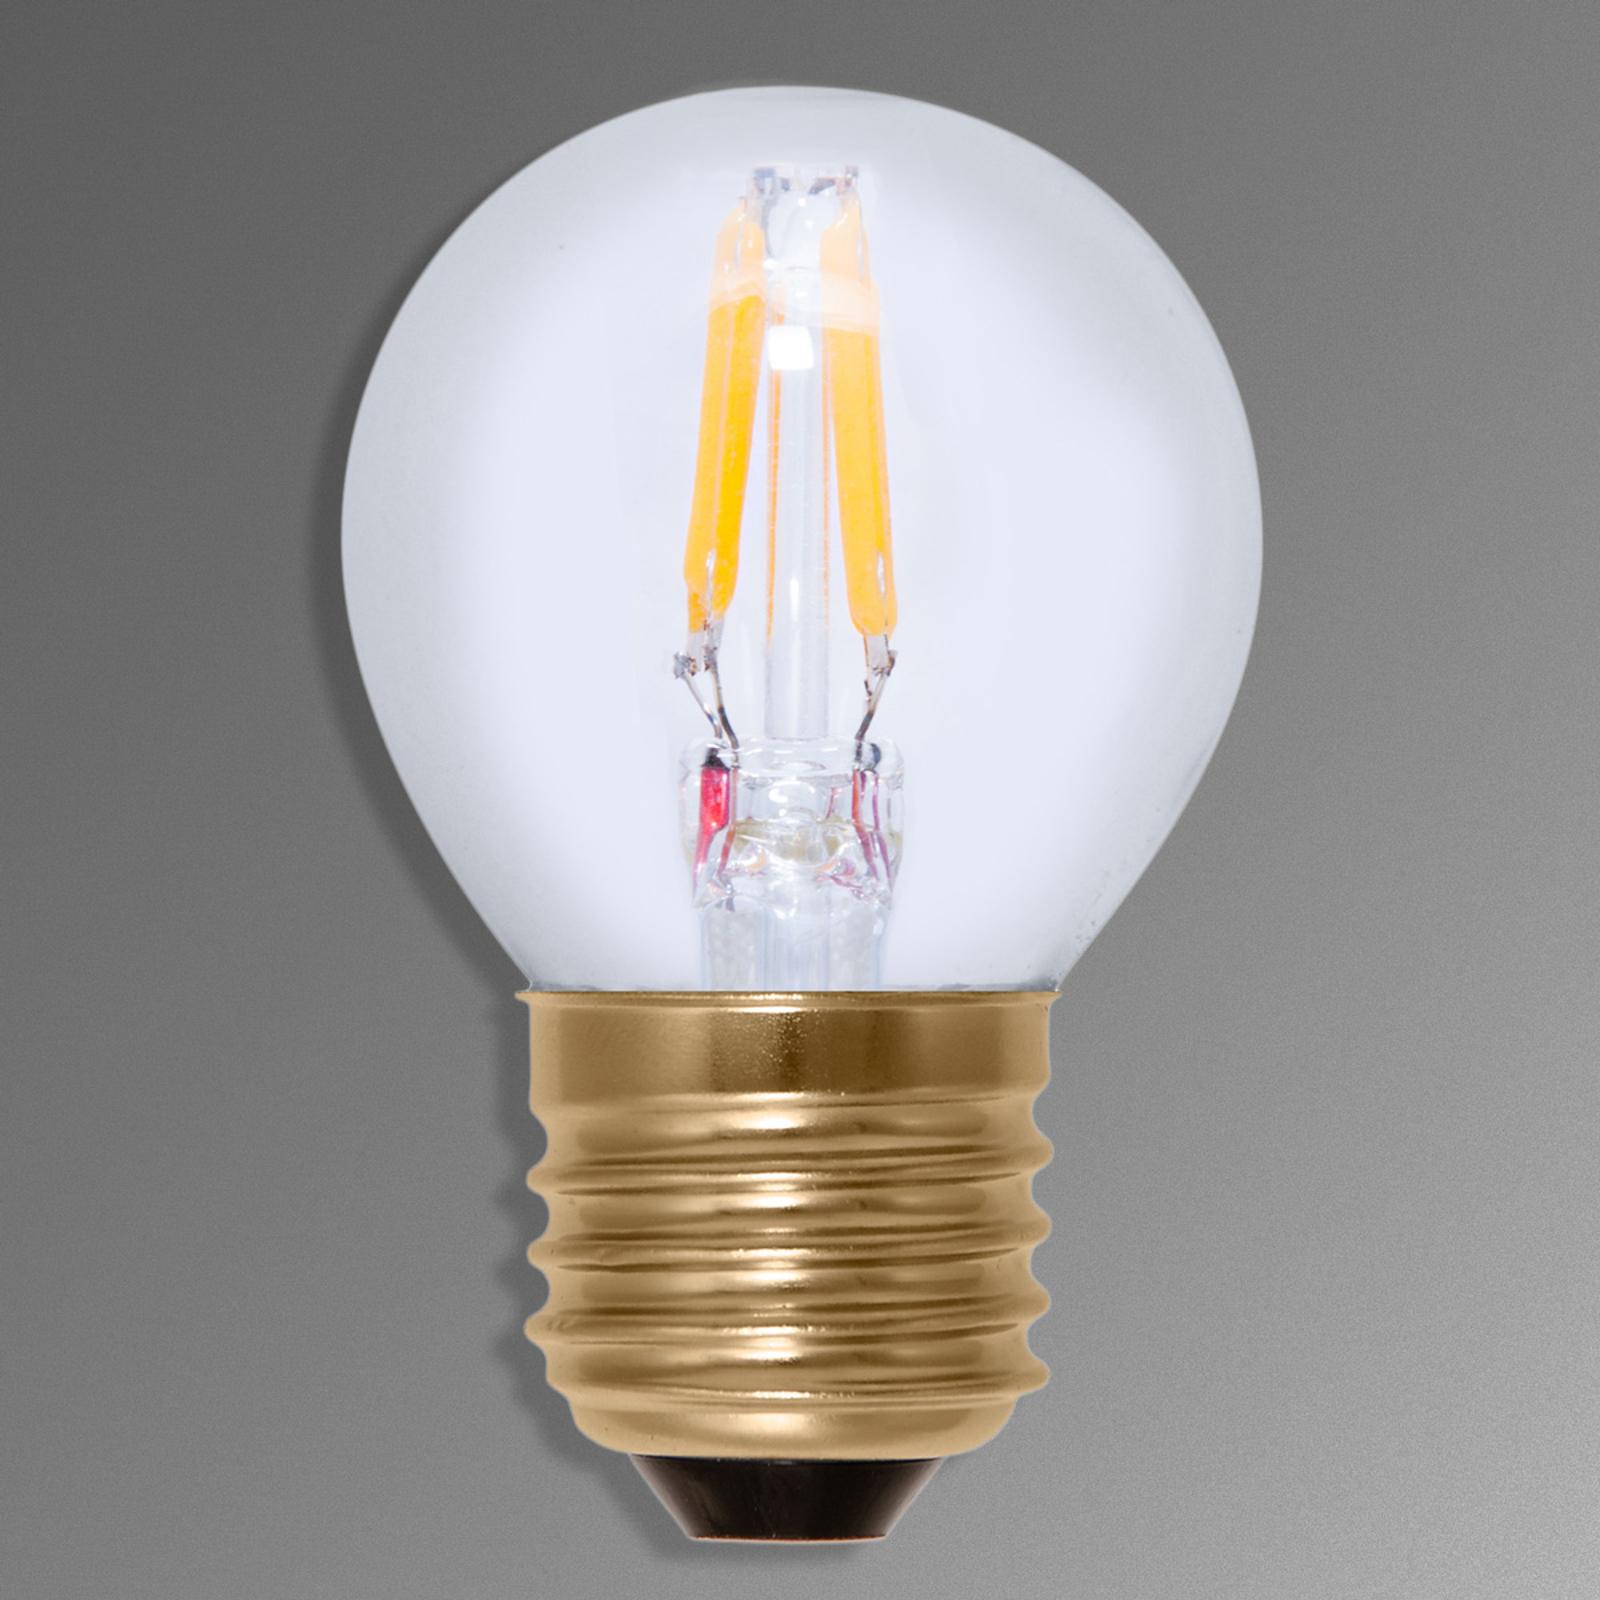 E27 2,7W 922 LED Tropfenlampe in Kohlefadenoptik